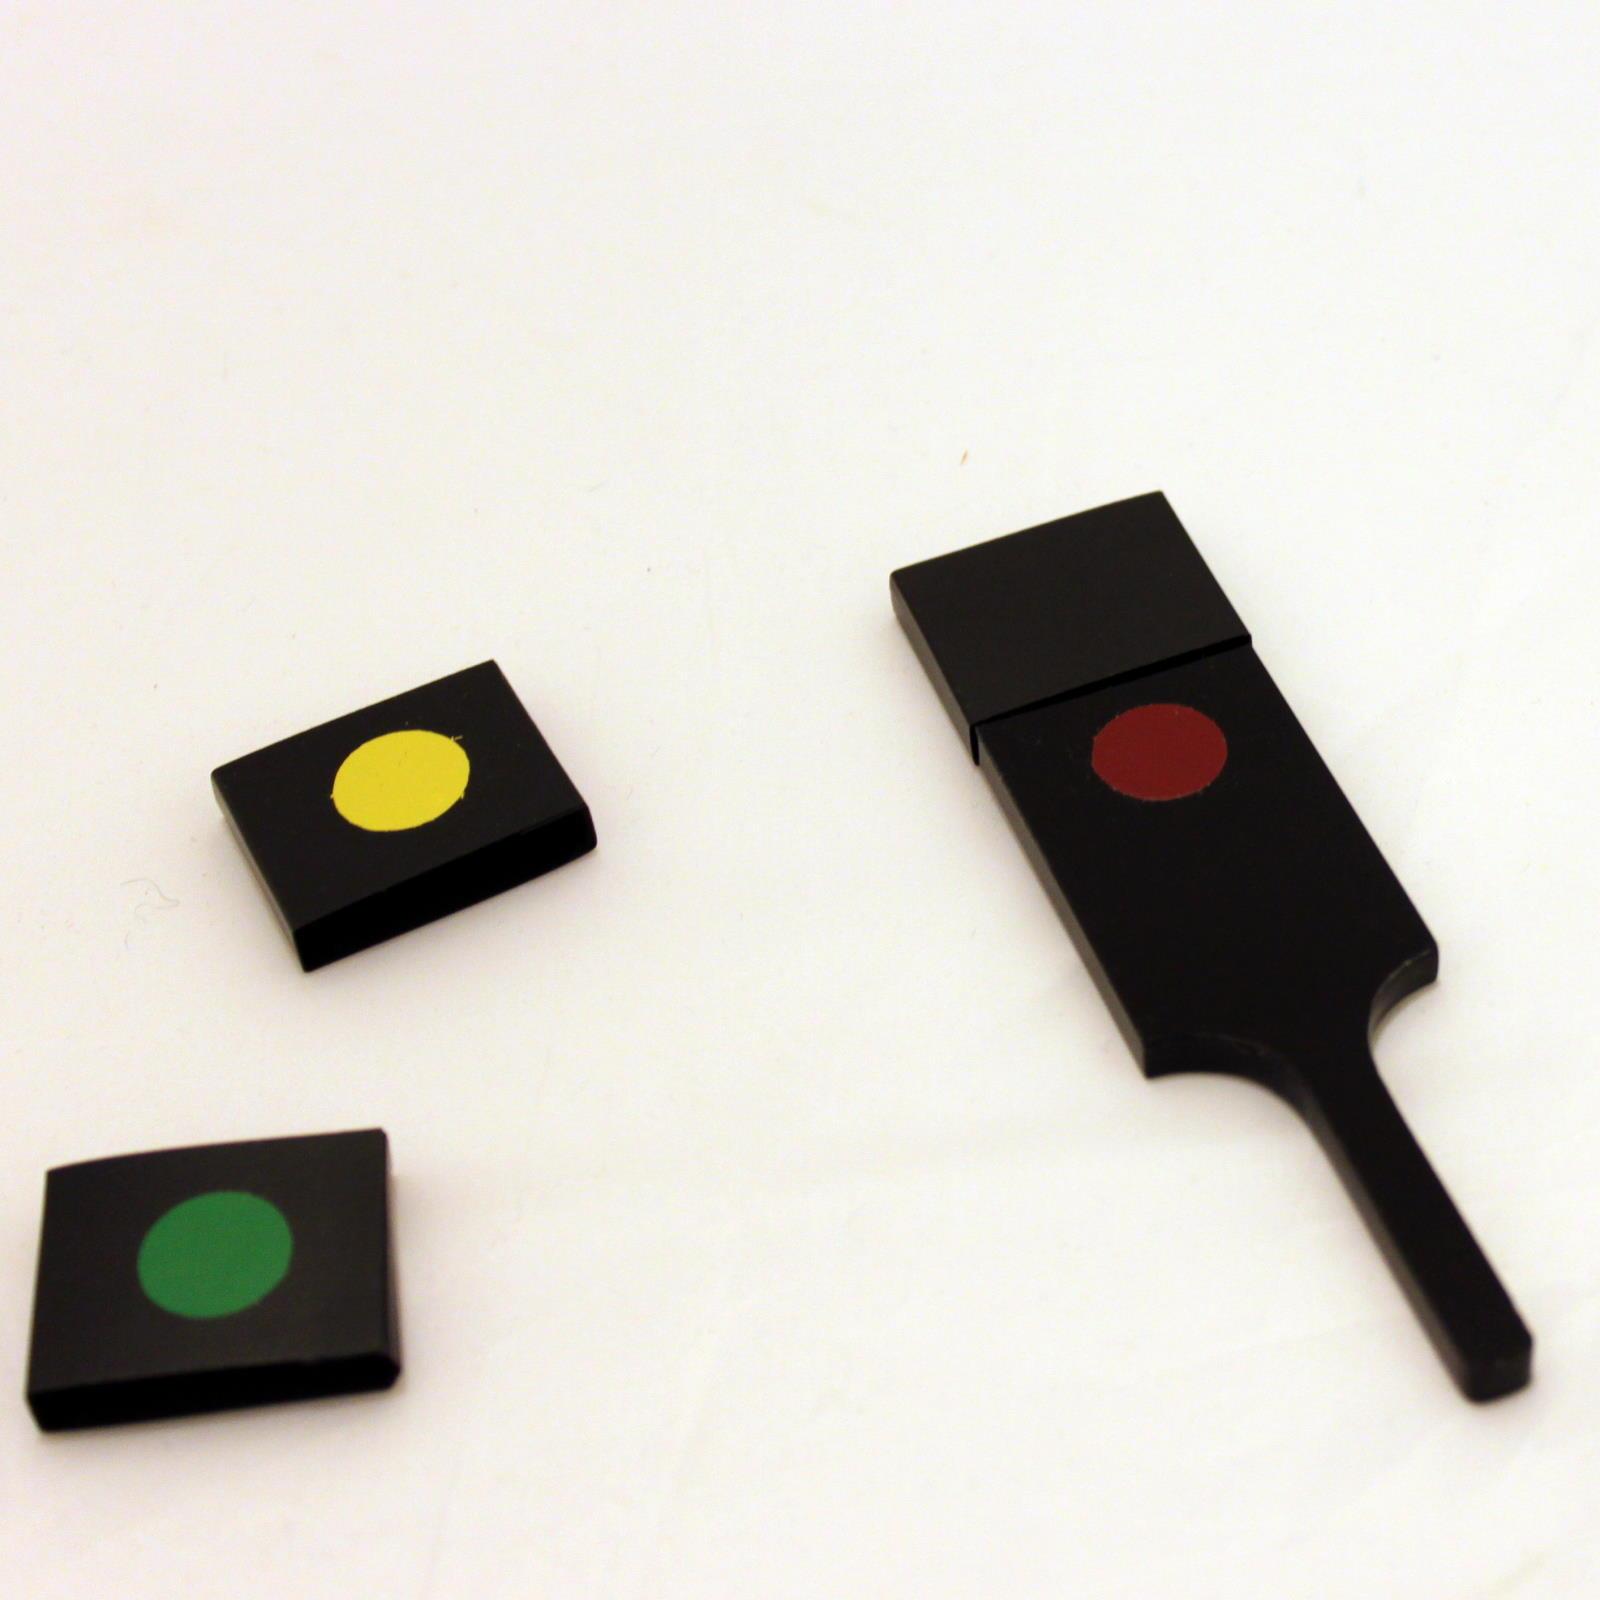 Paddle Waggle by Ian Adair